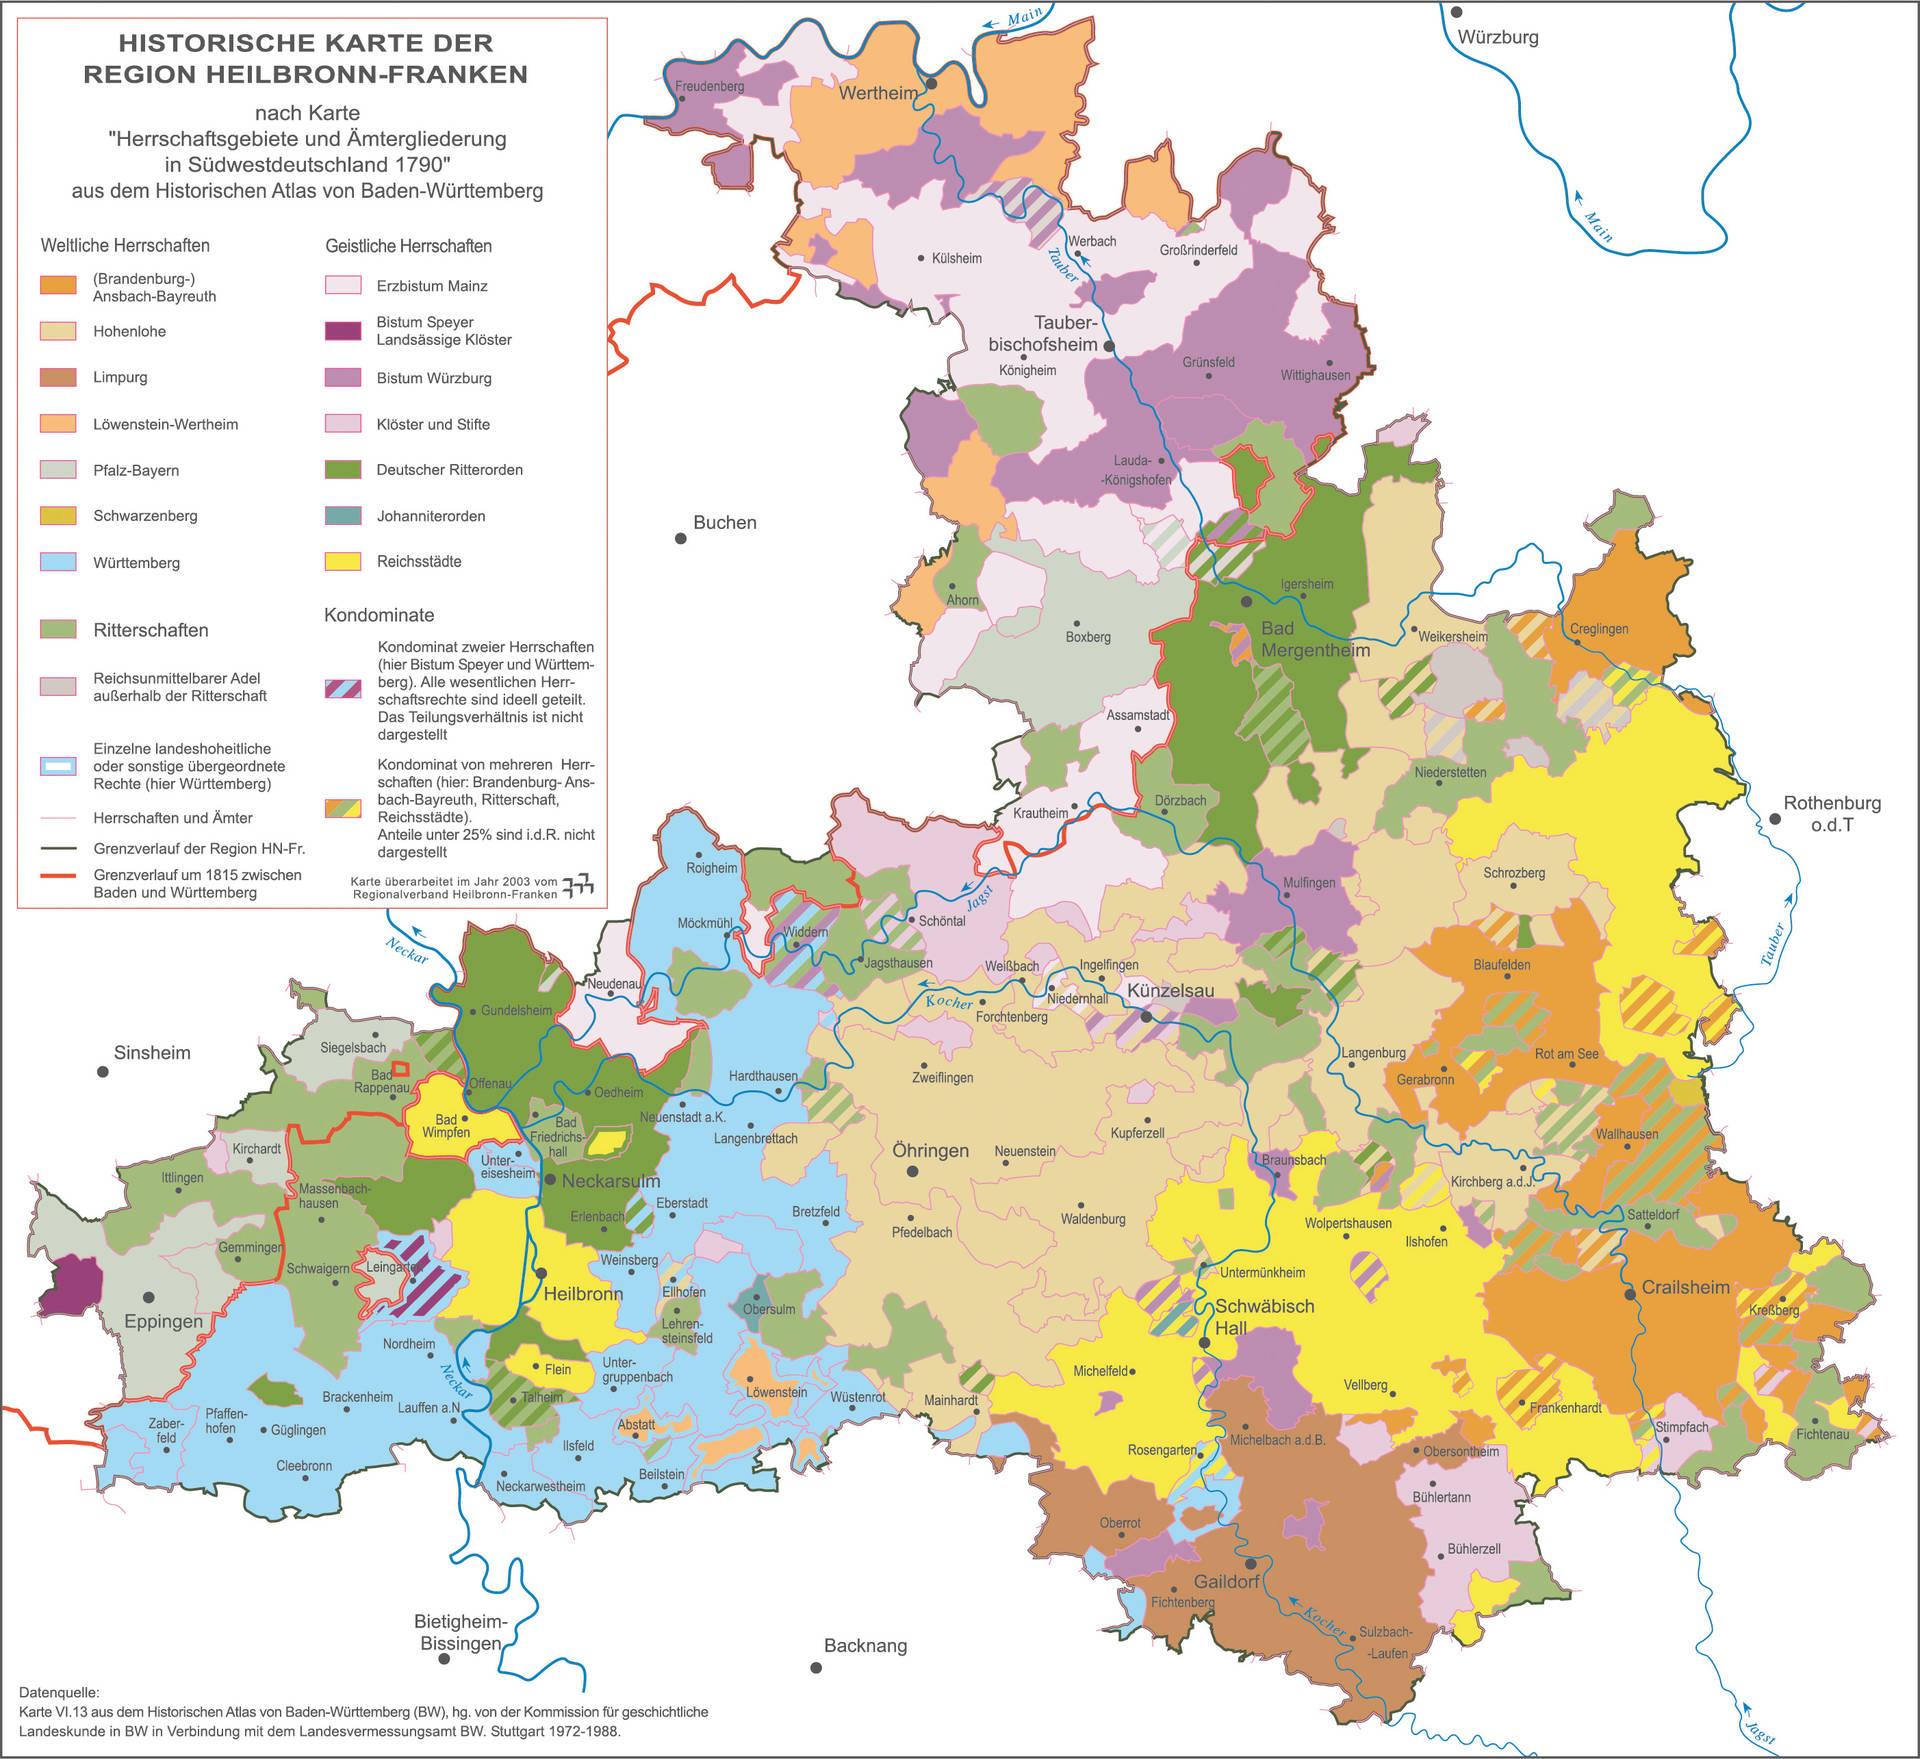 Heilbronn Karte Stadtplan.Heilbronn Karte